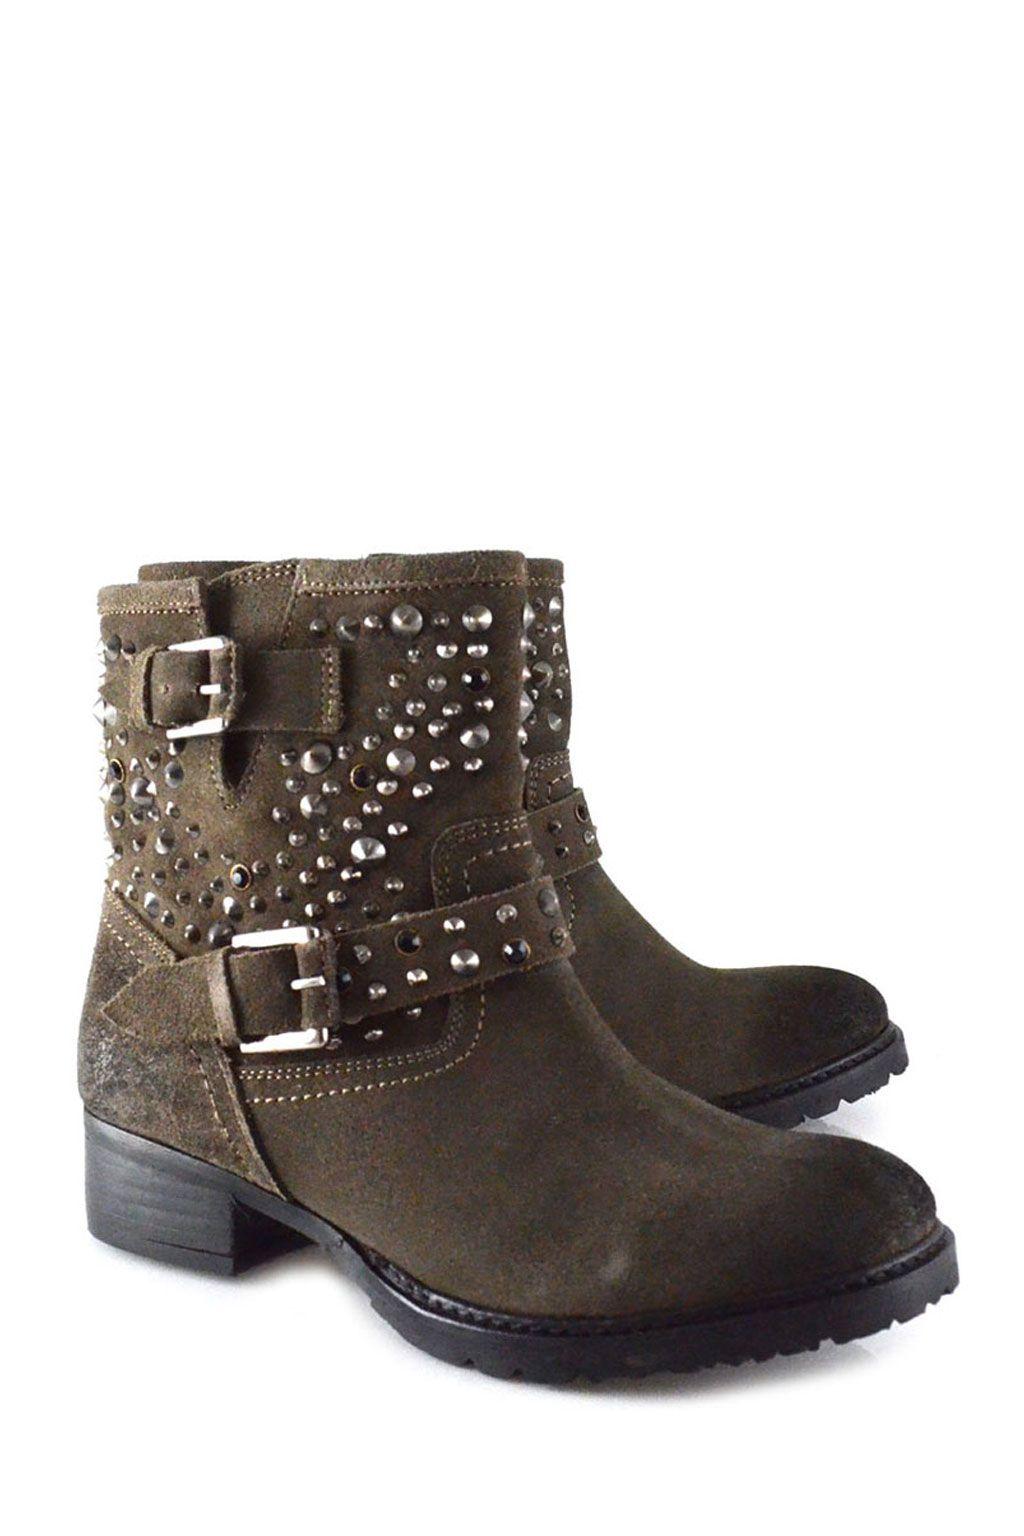 online retailer 4c43e ffba7 Lola Cruz brown biker boots >> shop online at www ...